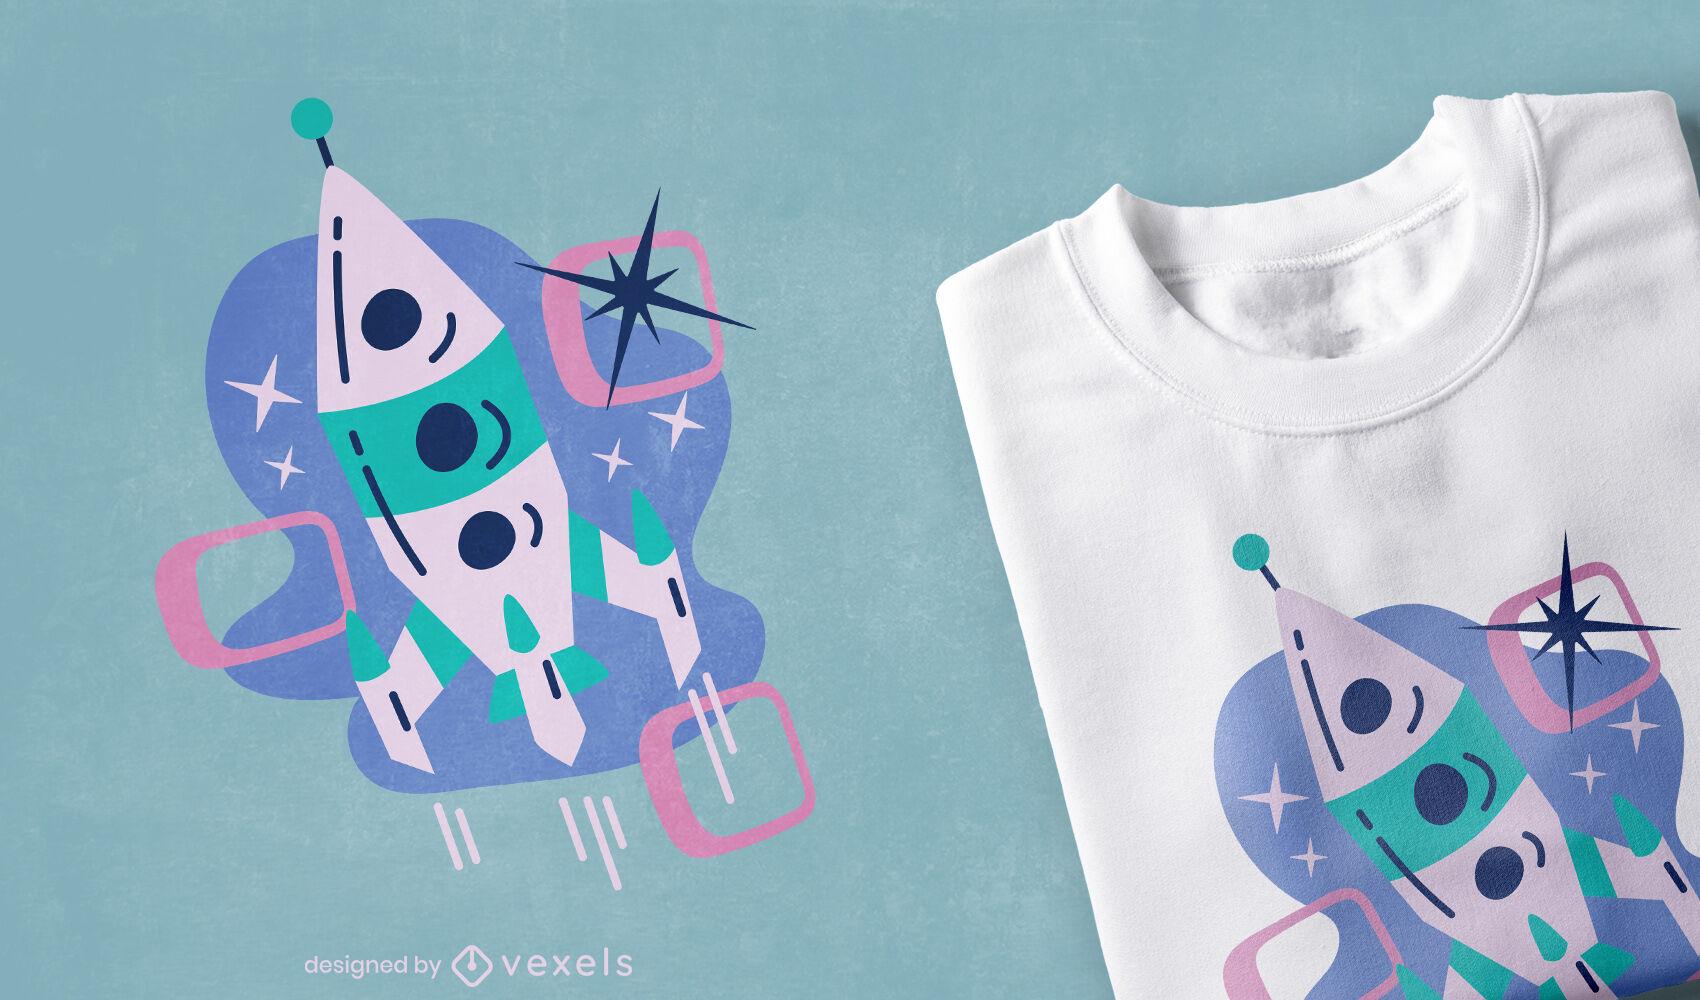 Diseño de camiseta de cohete de estilo vintage